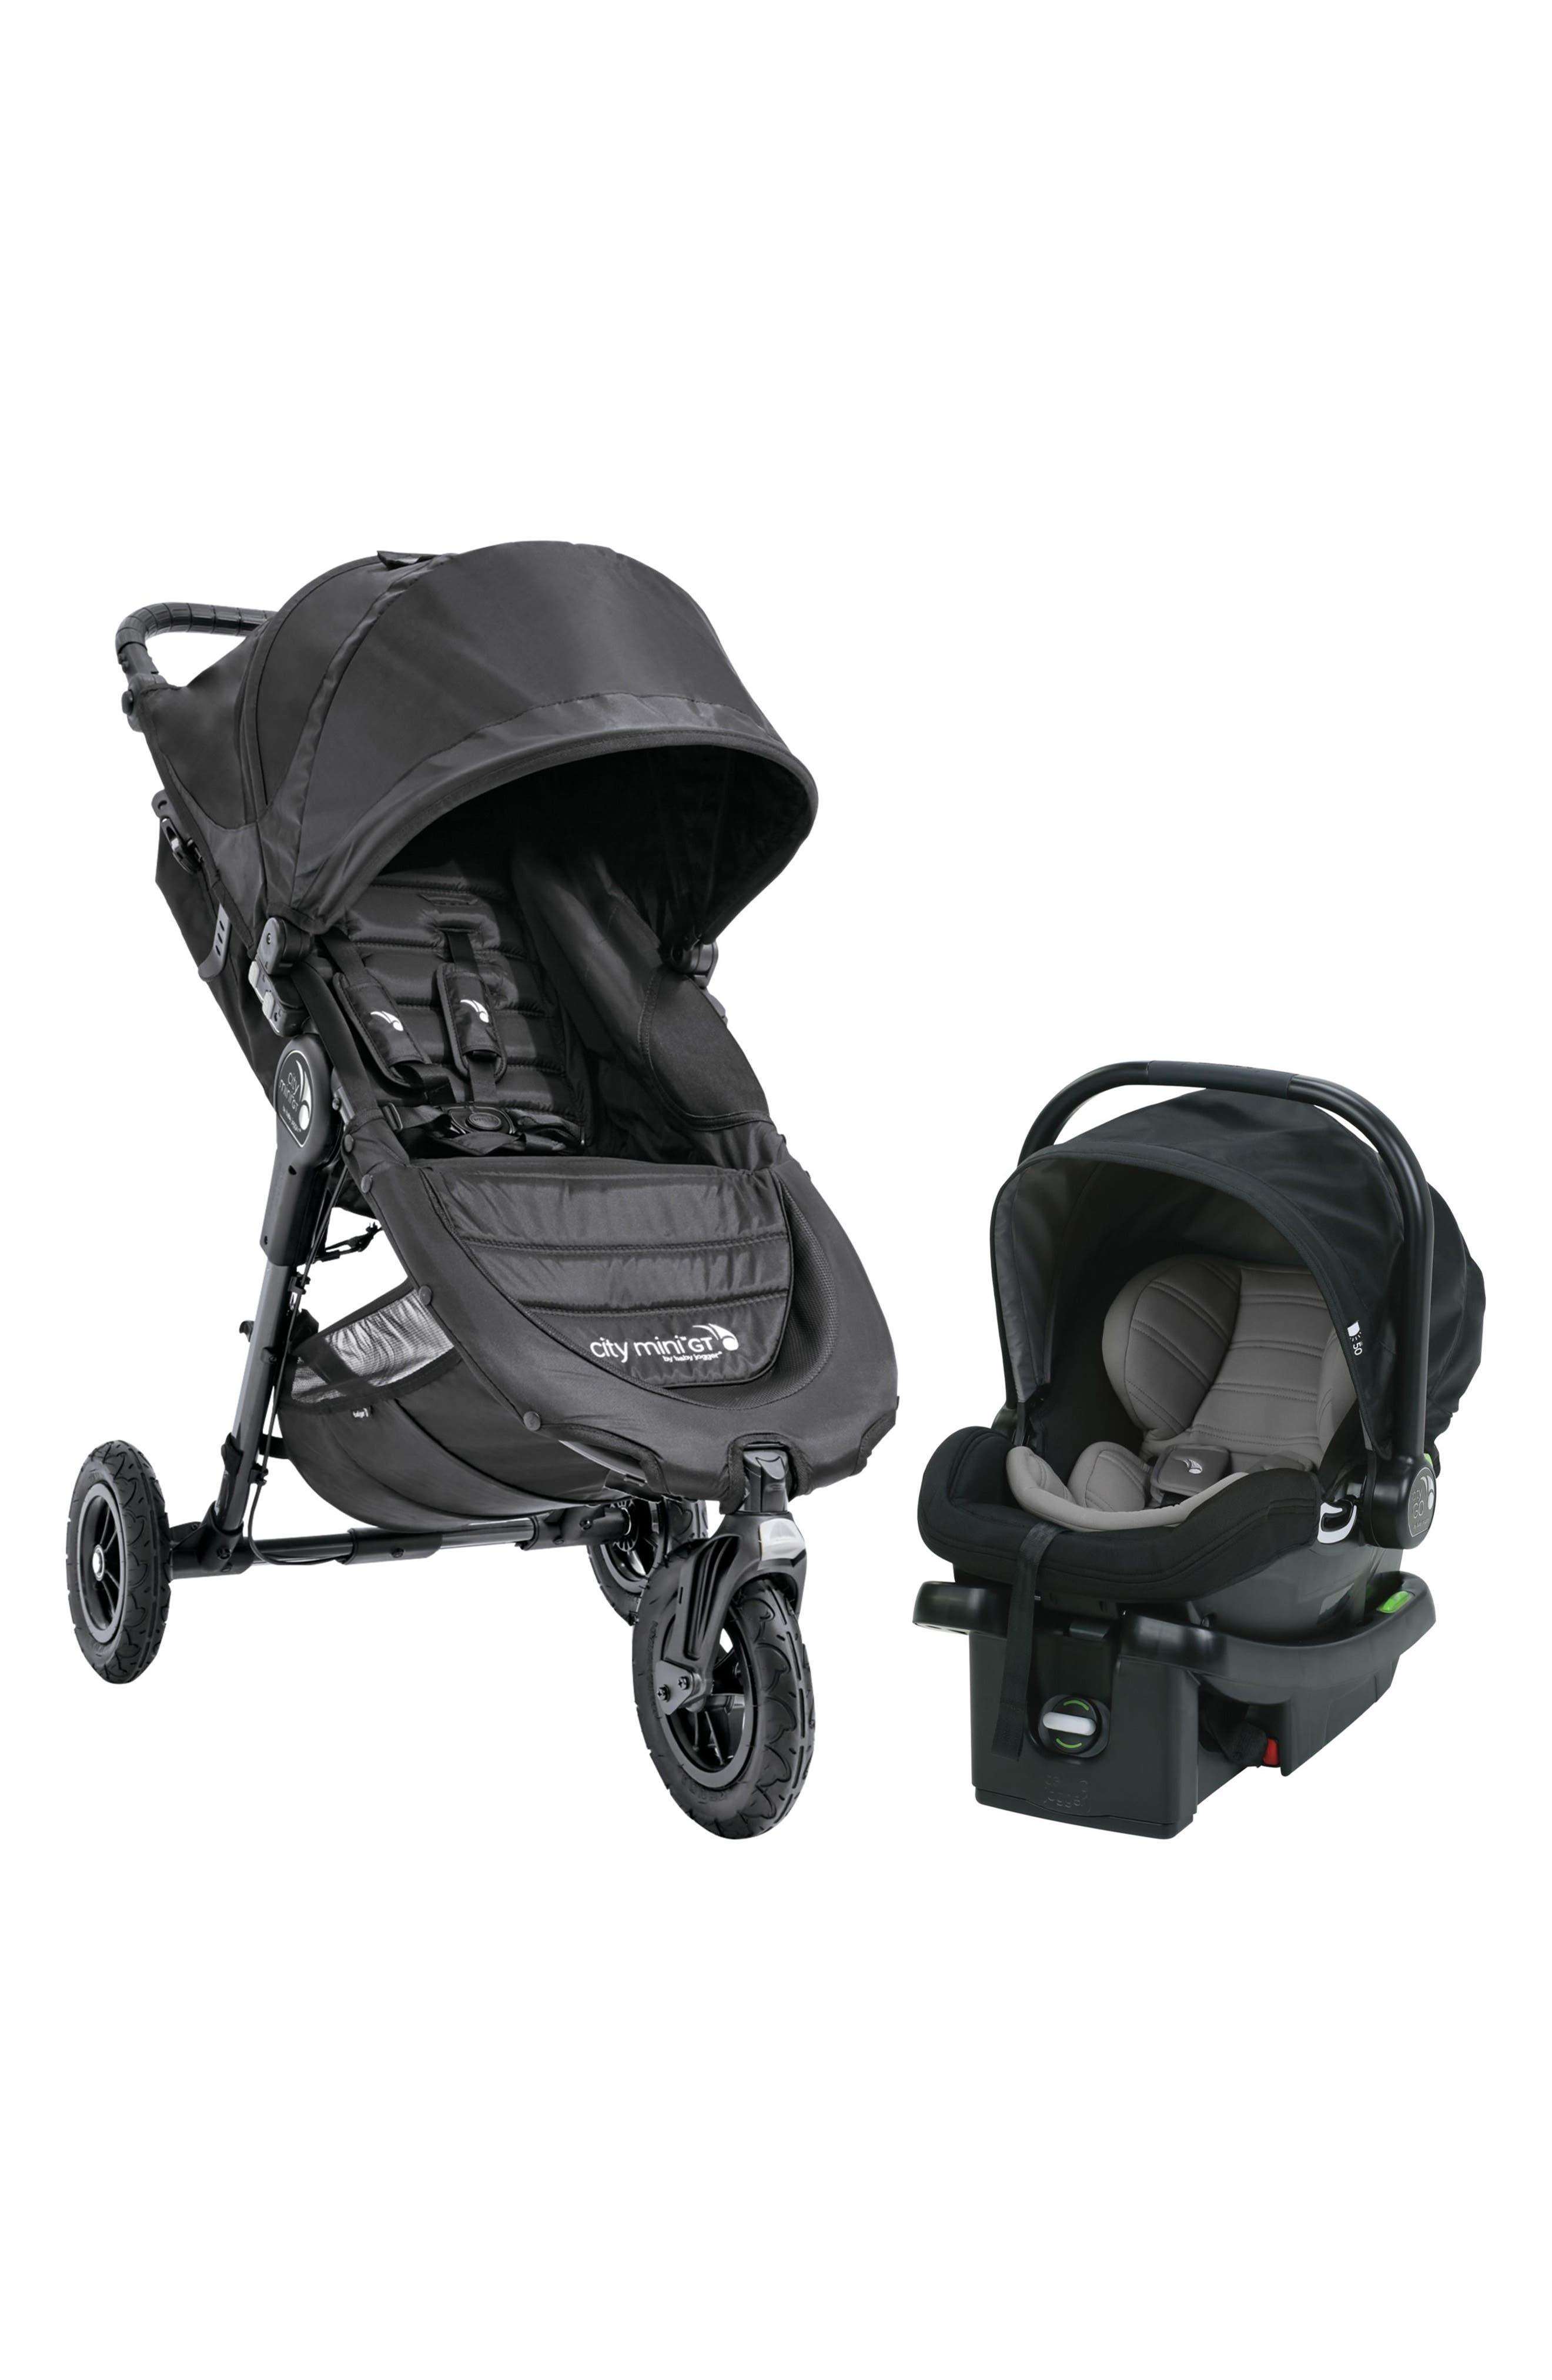 Main Image - Baby Jogger City Mini® Stroller & City Go® Infant Car Seat Travel System